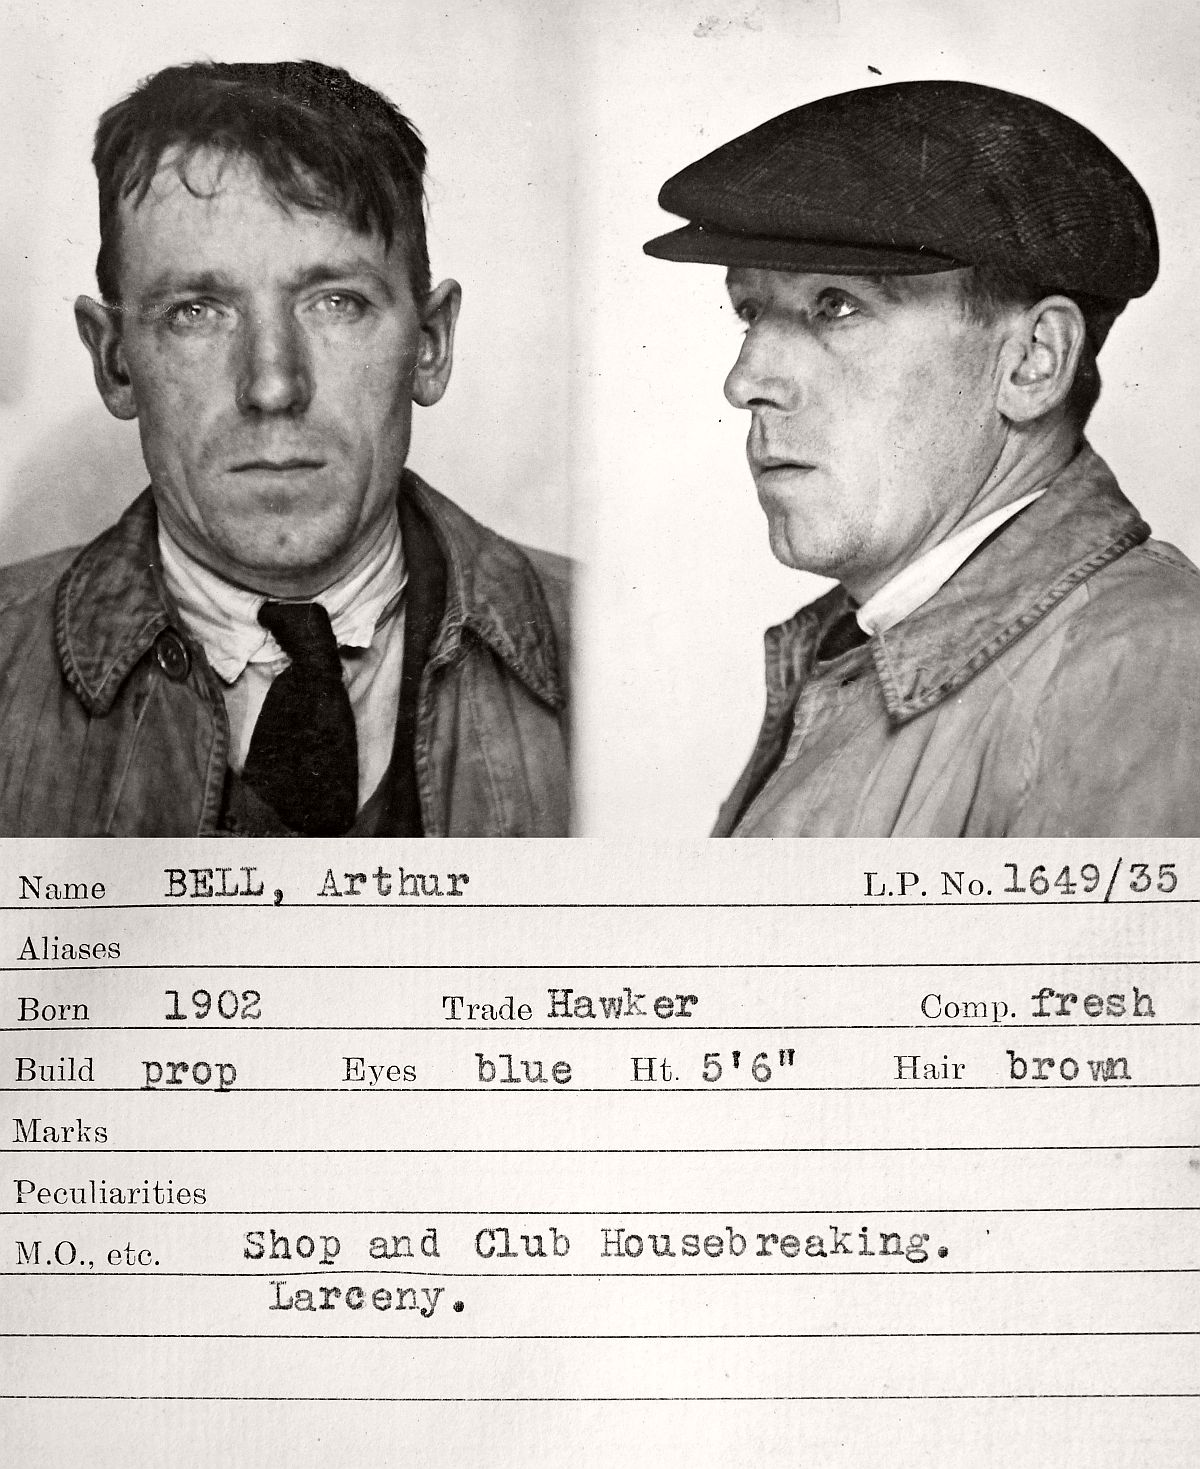 vintage-mug-shot-of-criminals-from-newcastle-upon-tyne-1930s-22